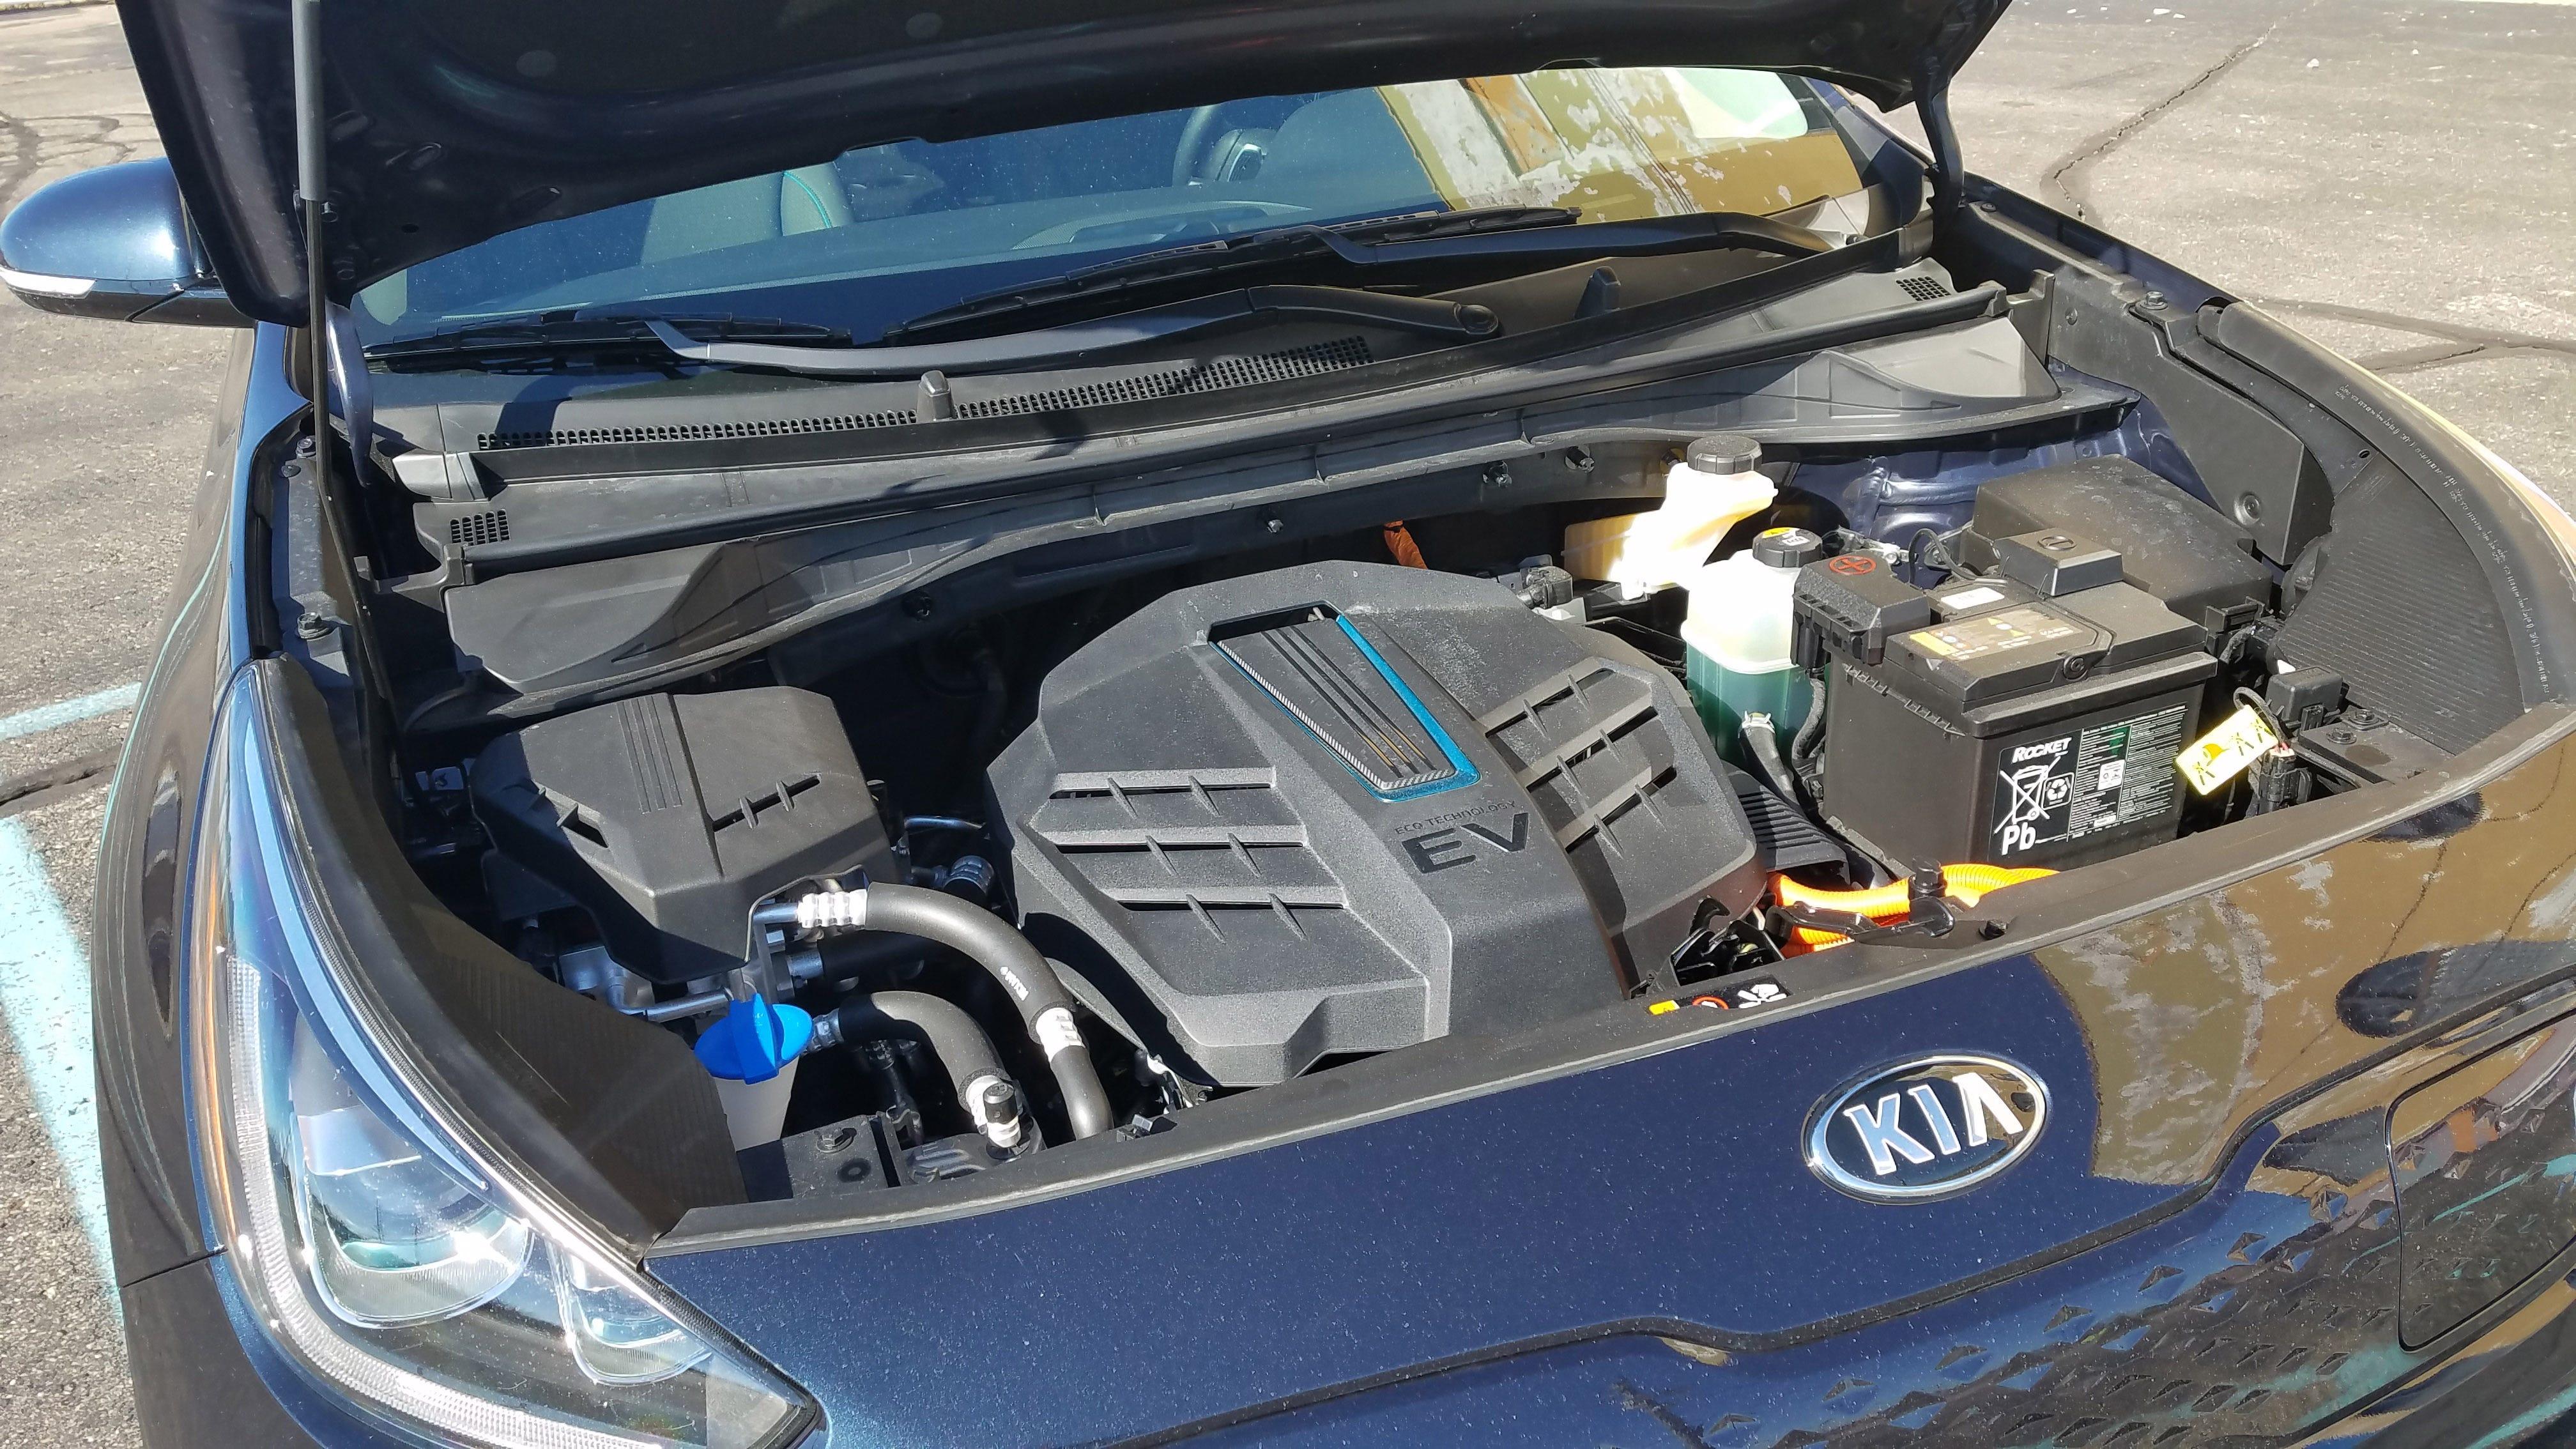 Payne Kia S Niro Electric Suv Shrugs Off The Cold